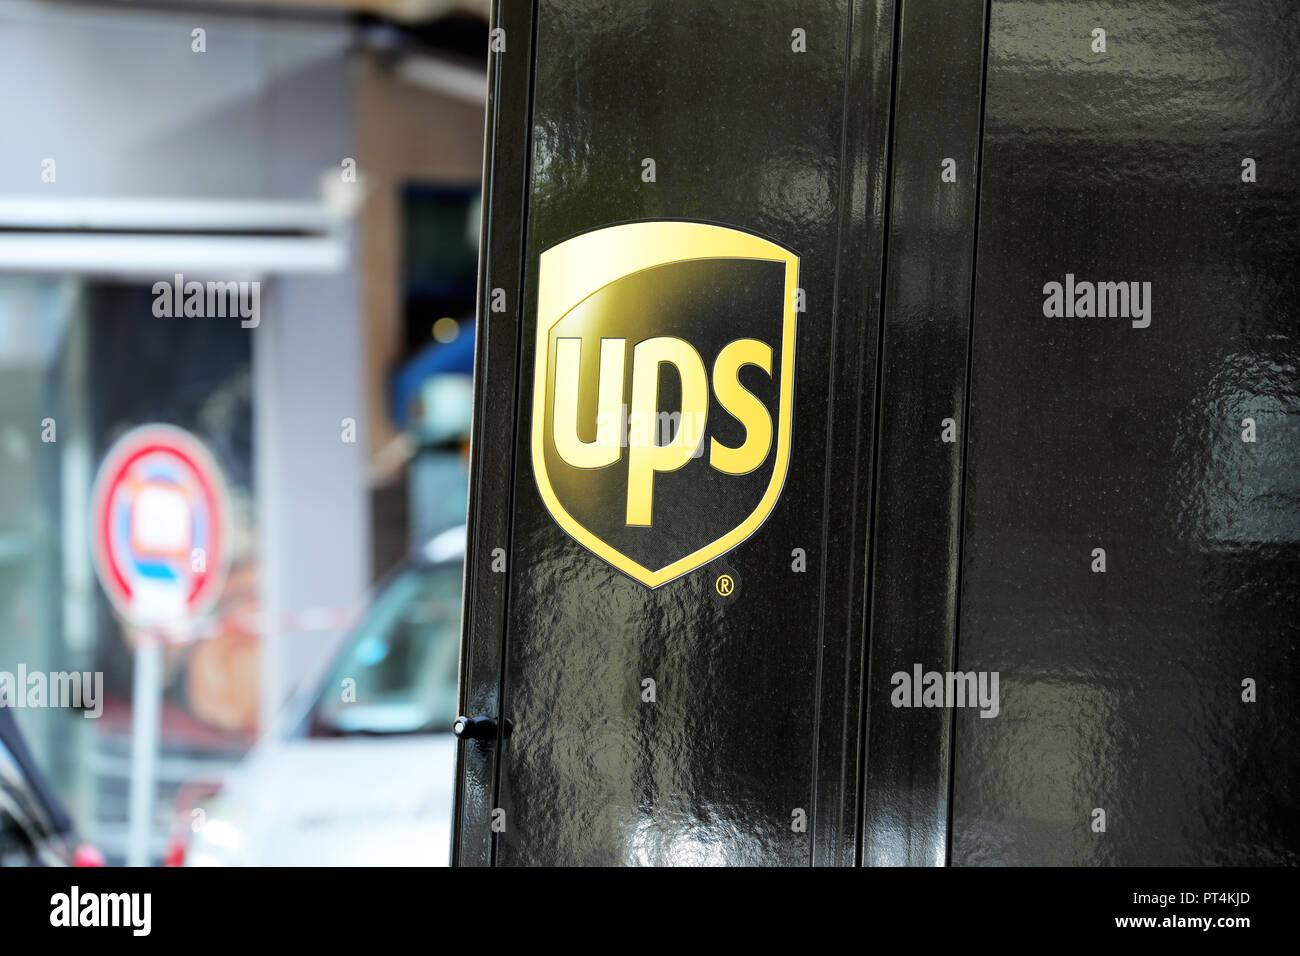 high resolution us postal service logo